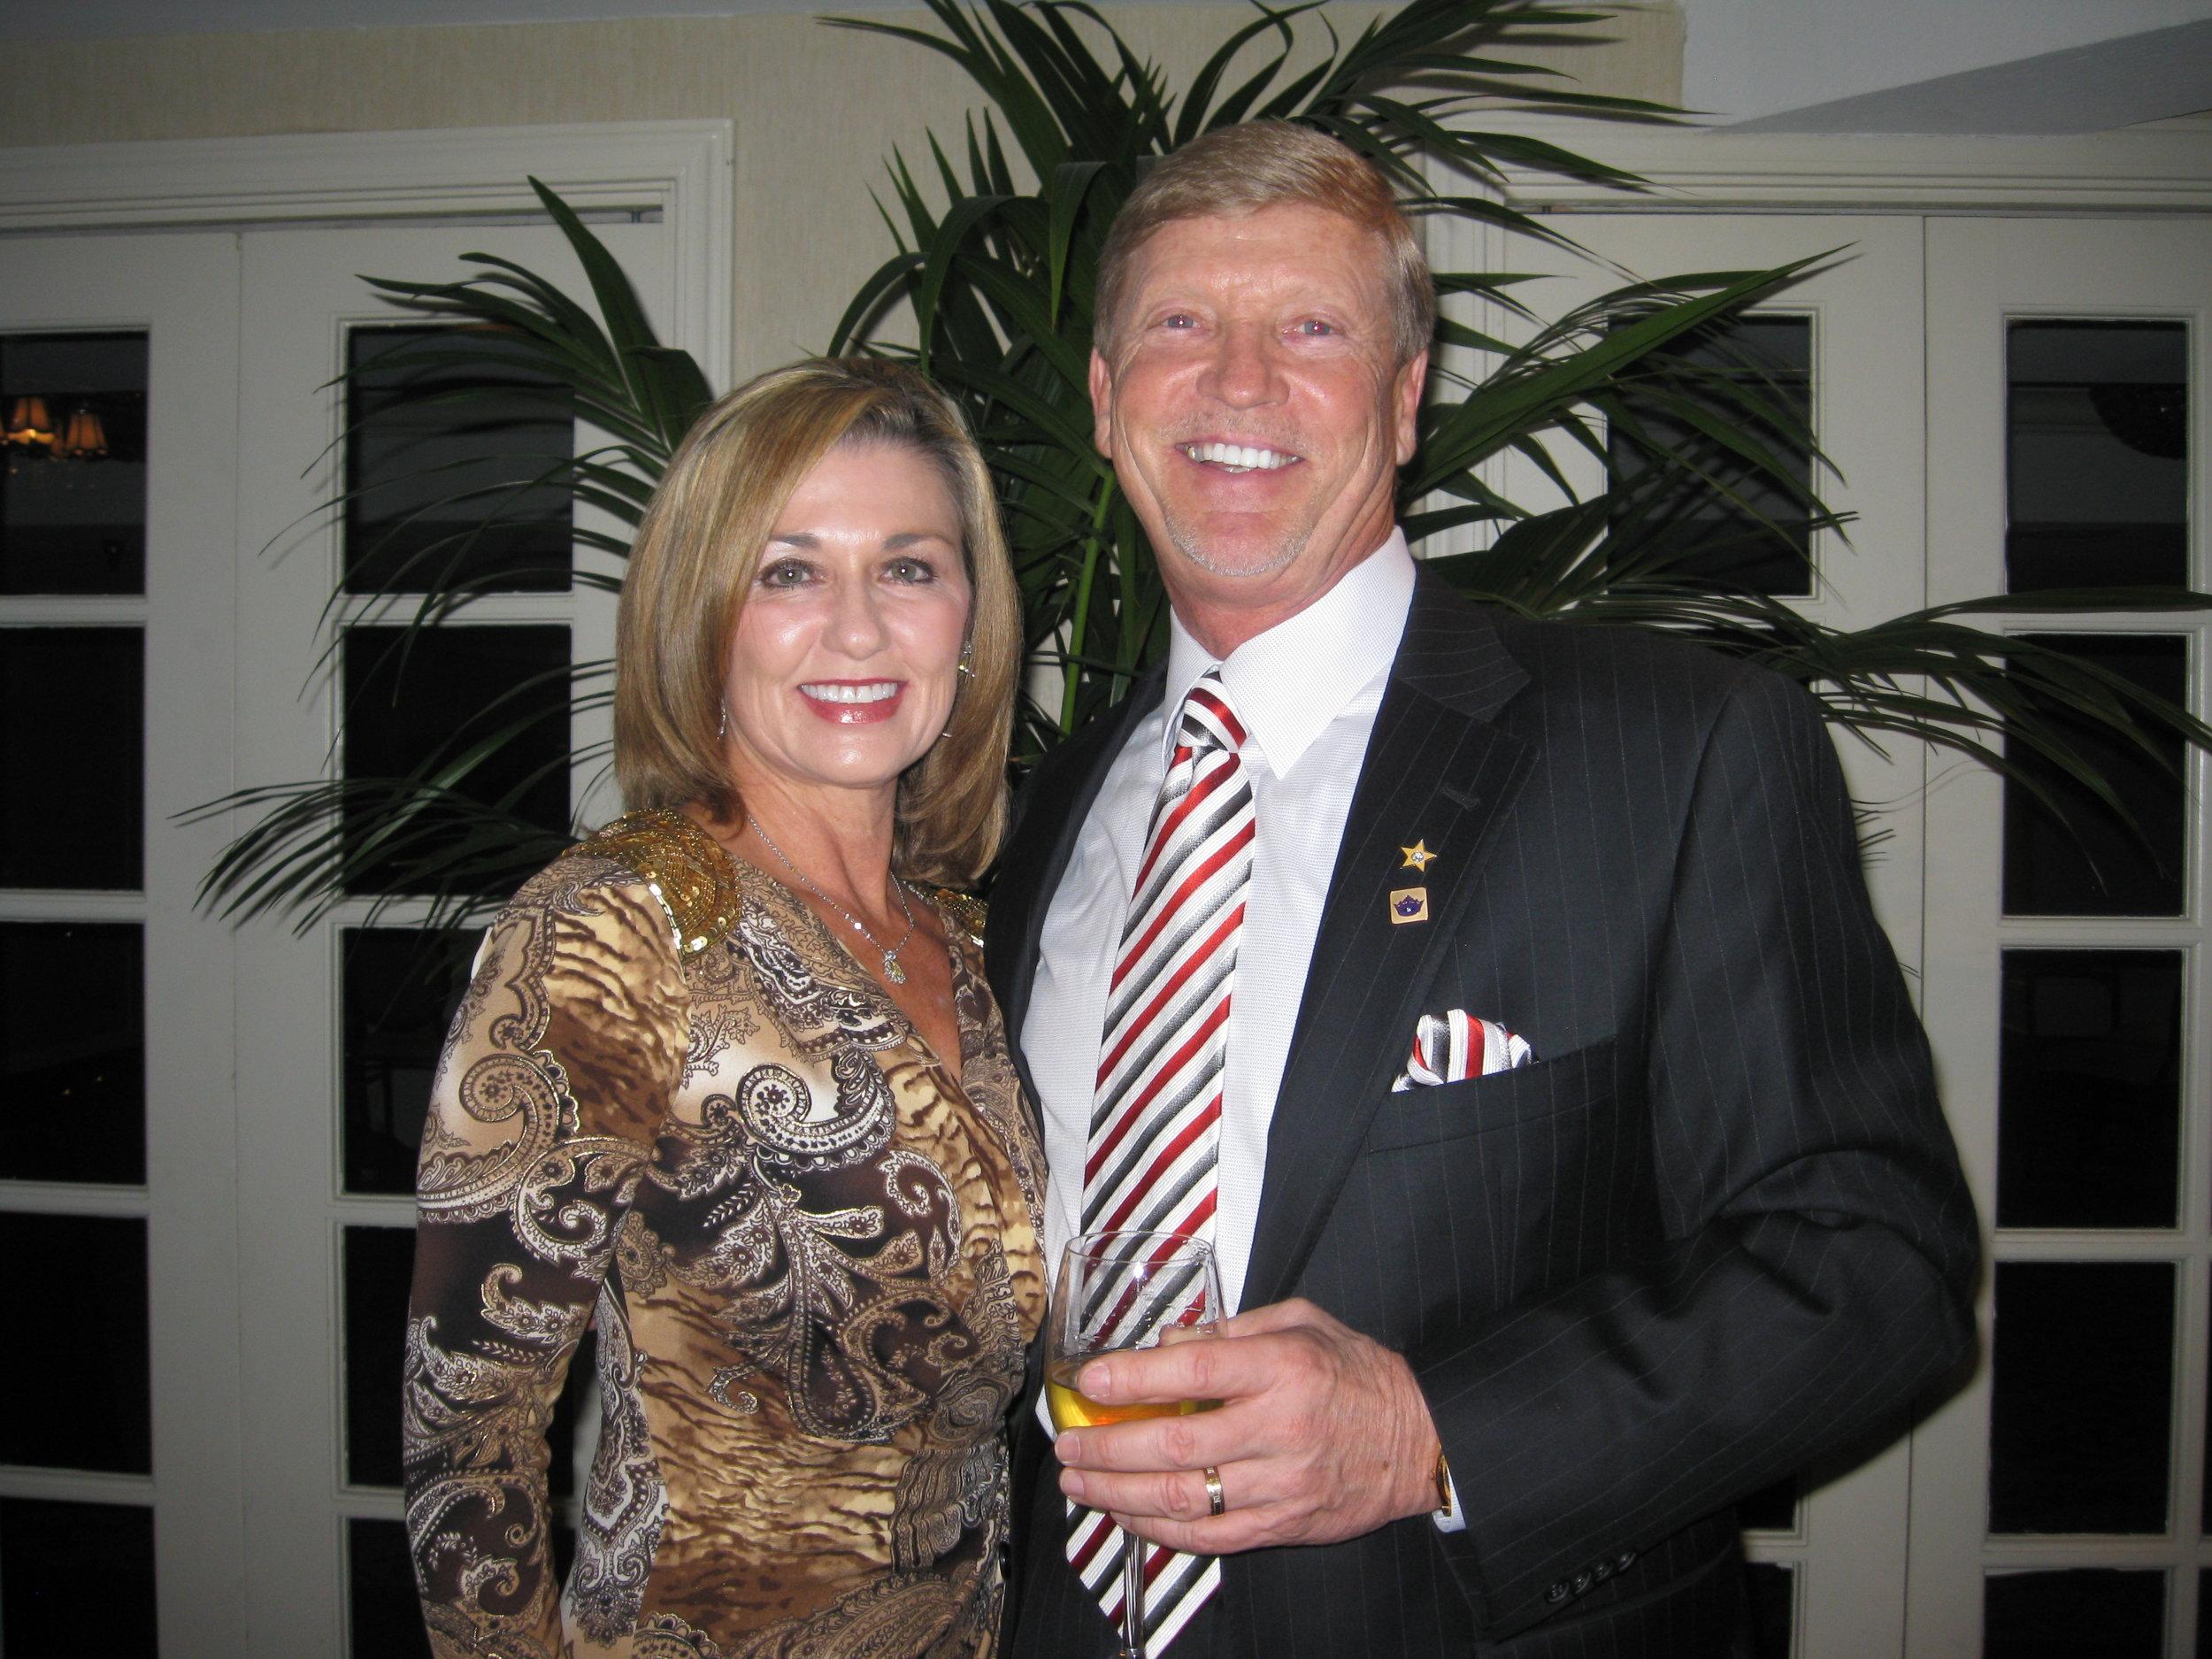 J.E. Funderburk with his wife, Sherri